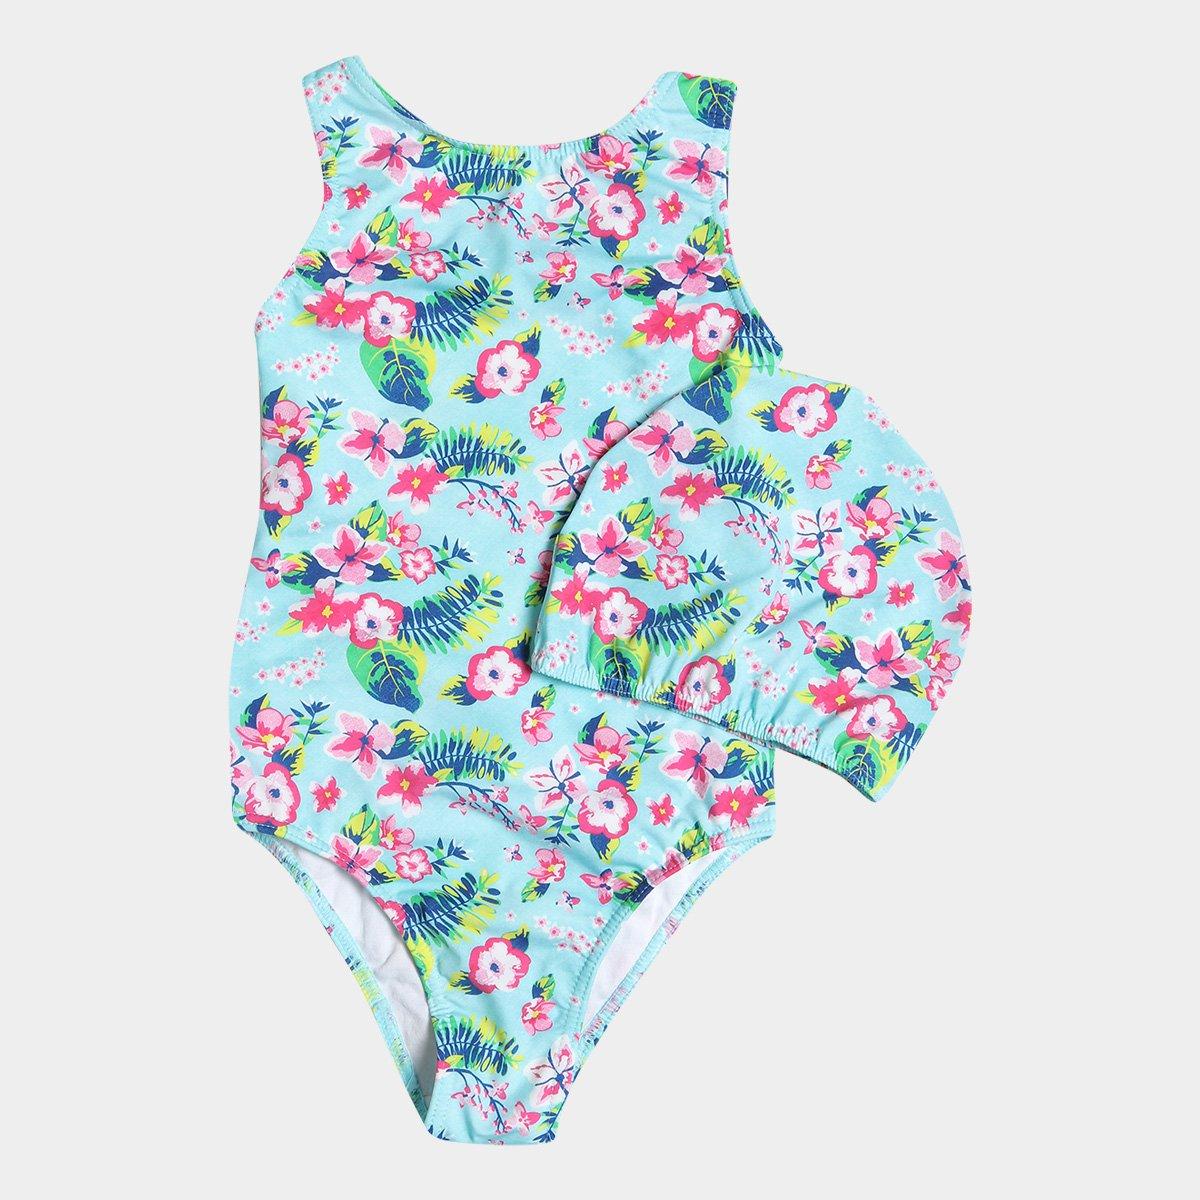 8532a9a50a1df Maiô Infantil Tip Top Summer Flower + Touca - Compre Agora